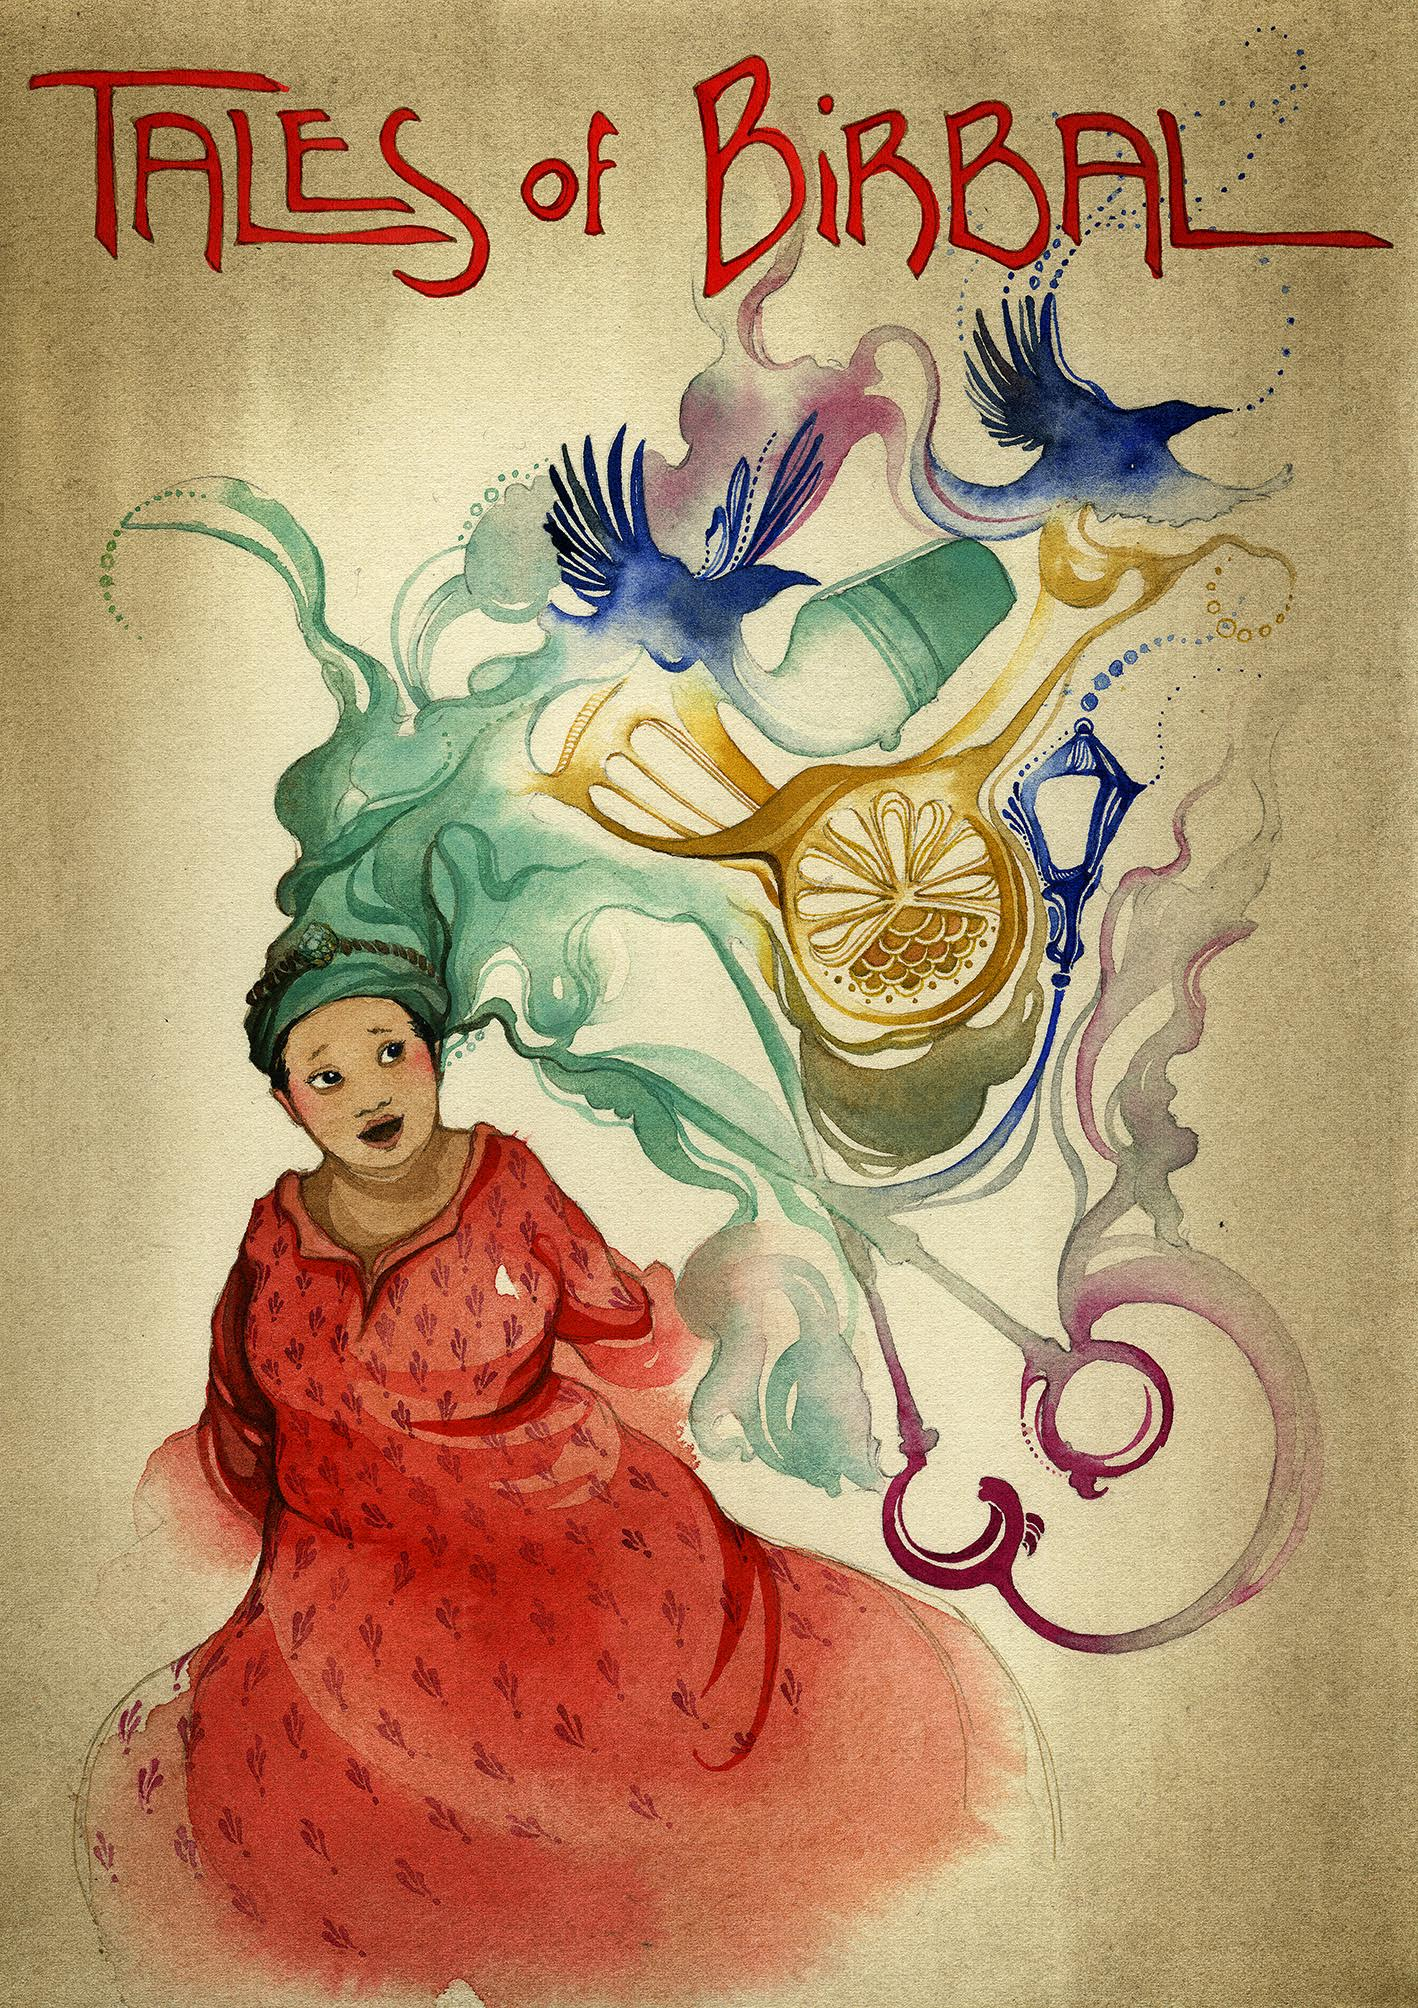 Tales-of-Birbal-image-A1-Daniela-Terrazzini (1)